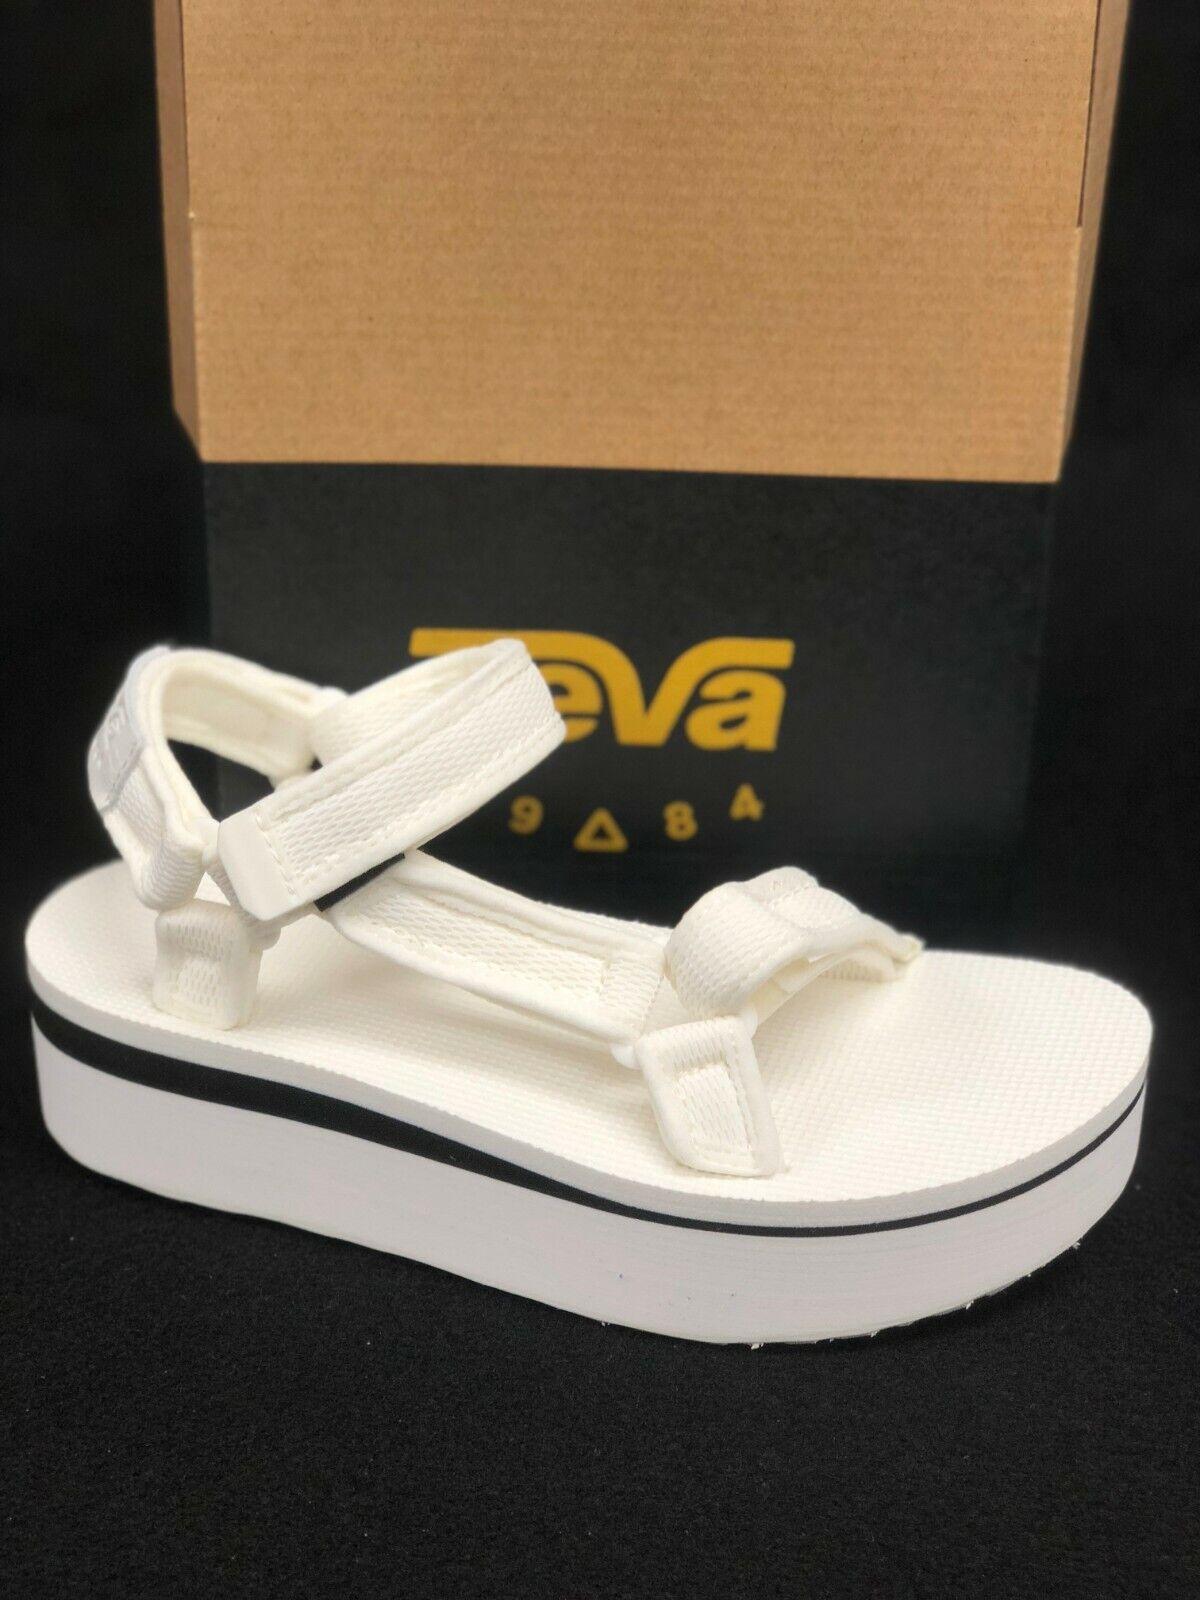 Teva Women's Flatform Universal Mesh Print Platform Sandals Bright White 1102451